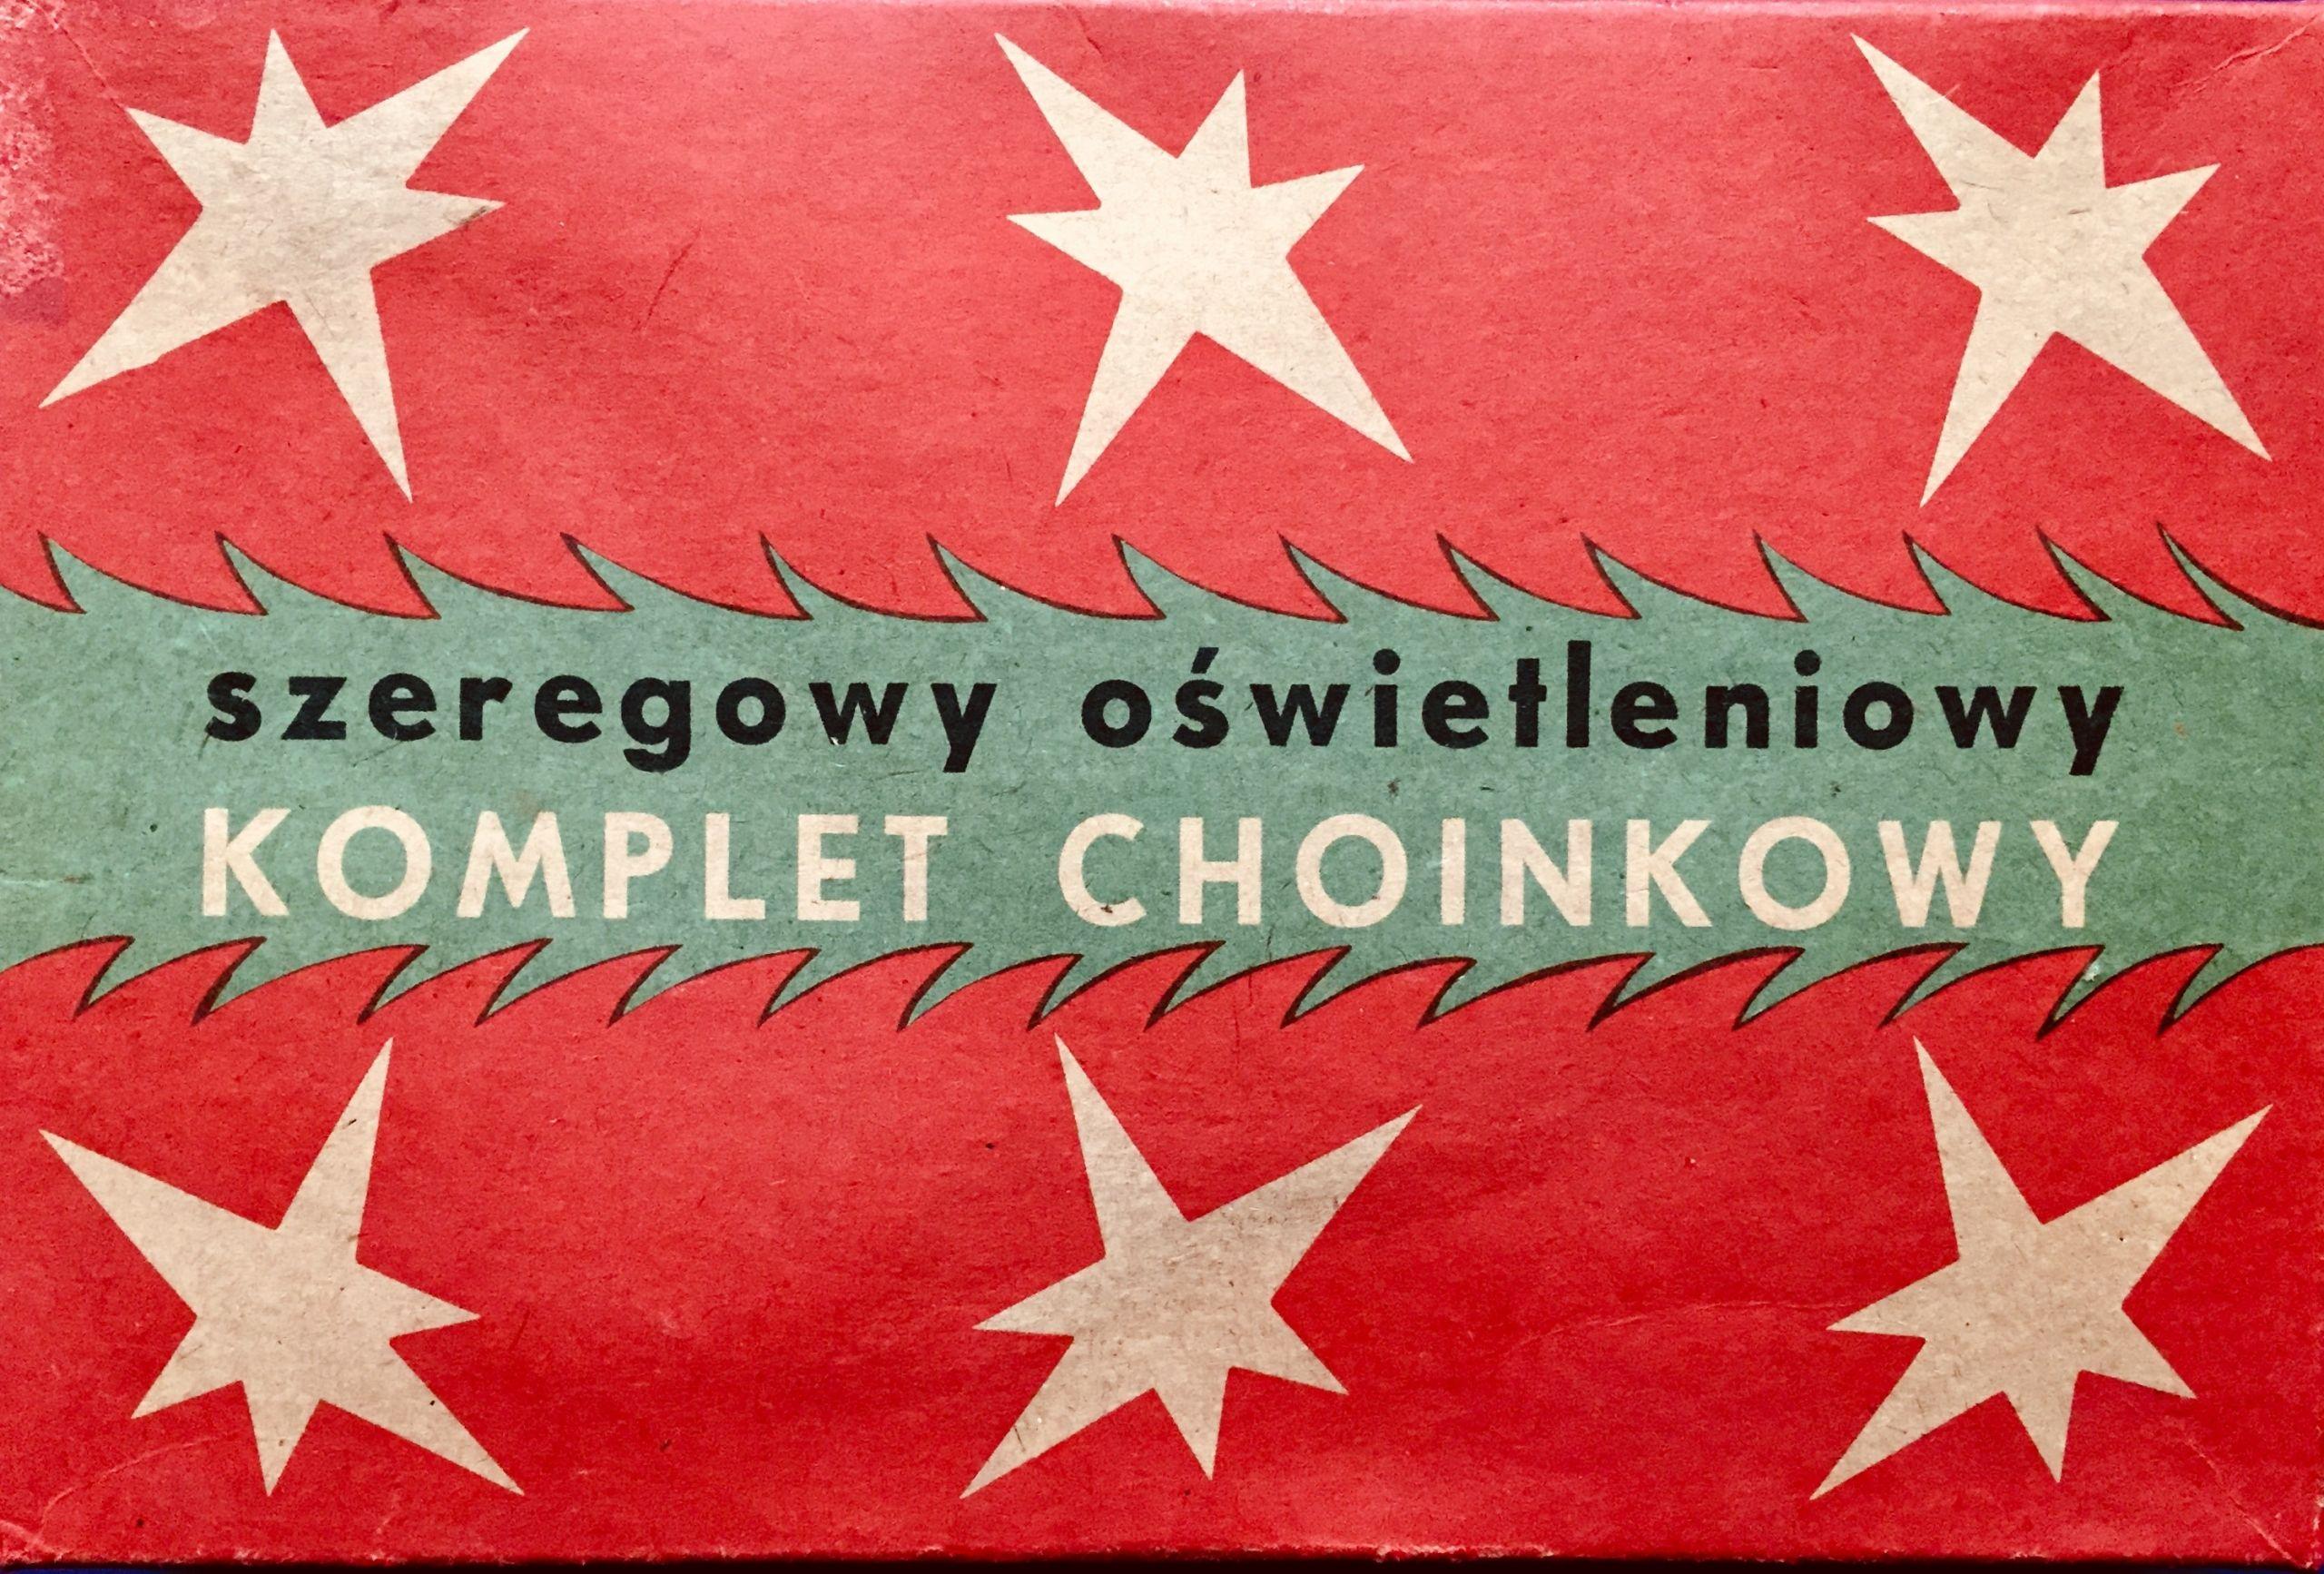 Lampki Choinkowe Z Czasow Prl Made In Poland 7713518793 Oficjalne Archiwum Allegro Novelty Sign Novelty Decor